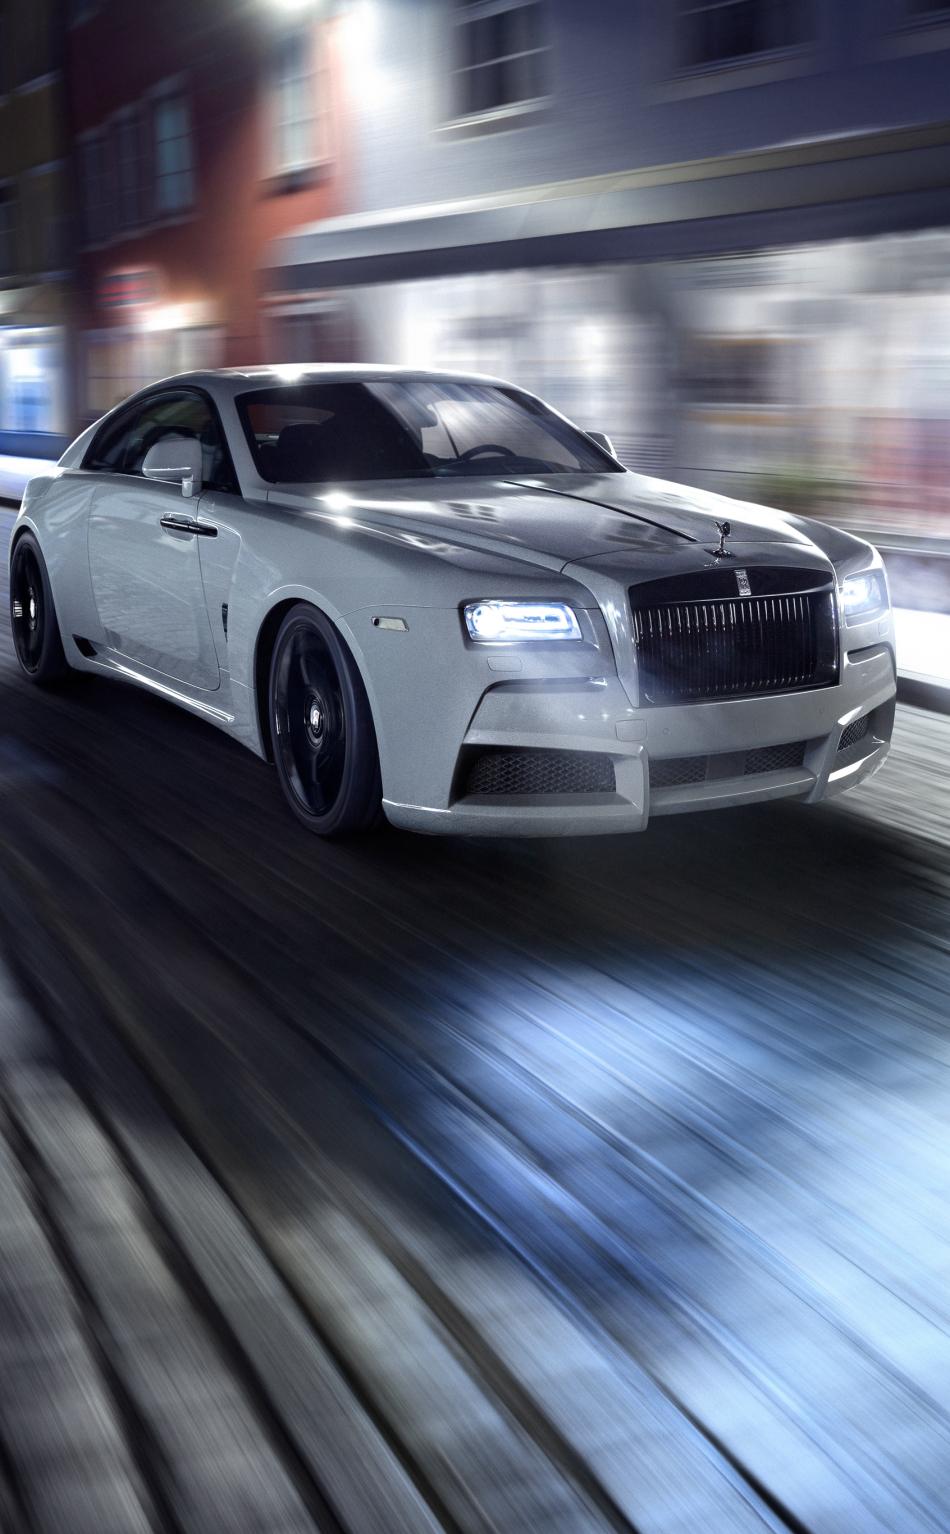 950x1534 rolls-royce, spofec, white 950x1534 Resolution ...